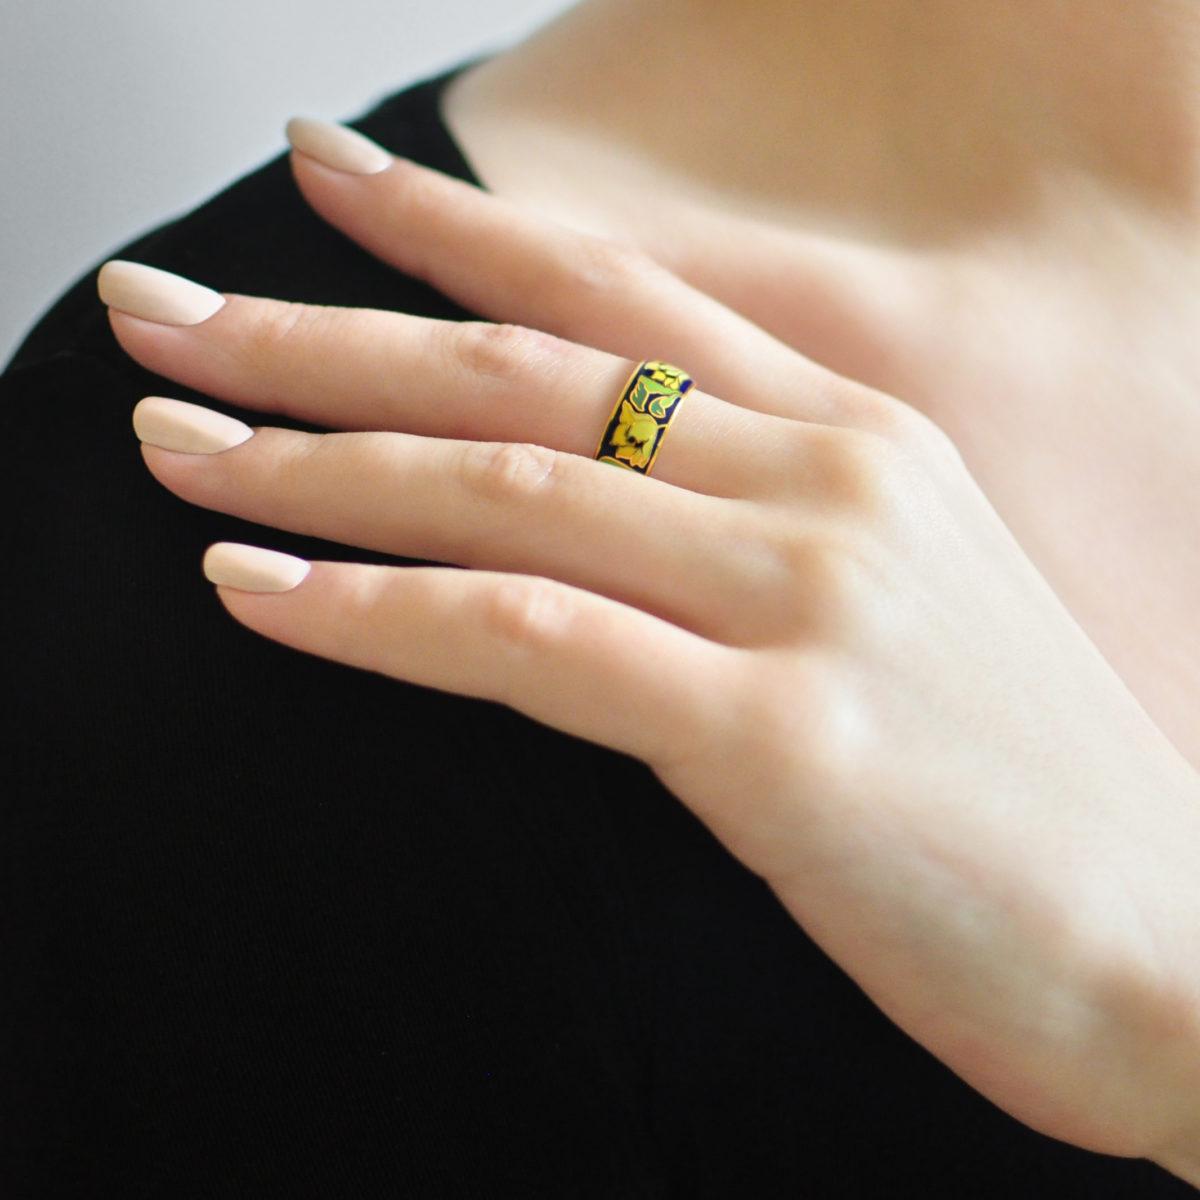 Zolochenie zheltaya 1200x1200 - Кольцо из серебра «Тюльпаны» (золочение), желтое